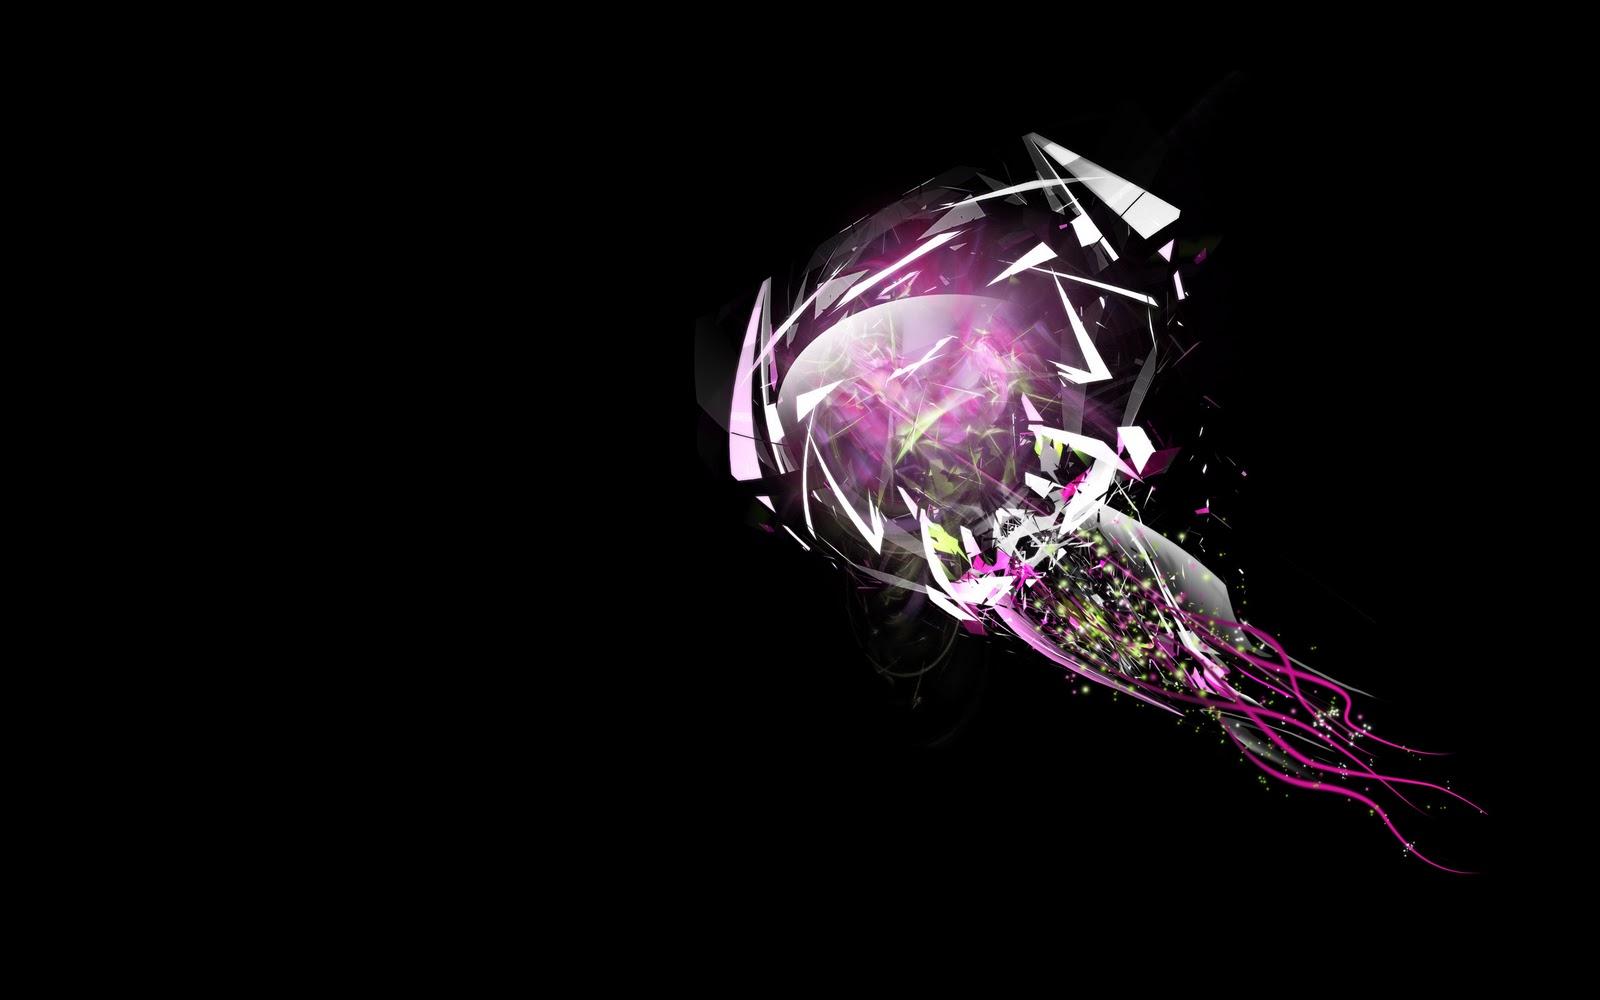 digital 3d abstract art hd wallpaper 2011 download wallpapers 1600x1000